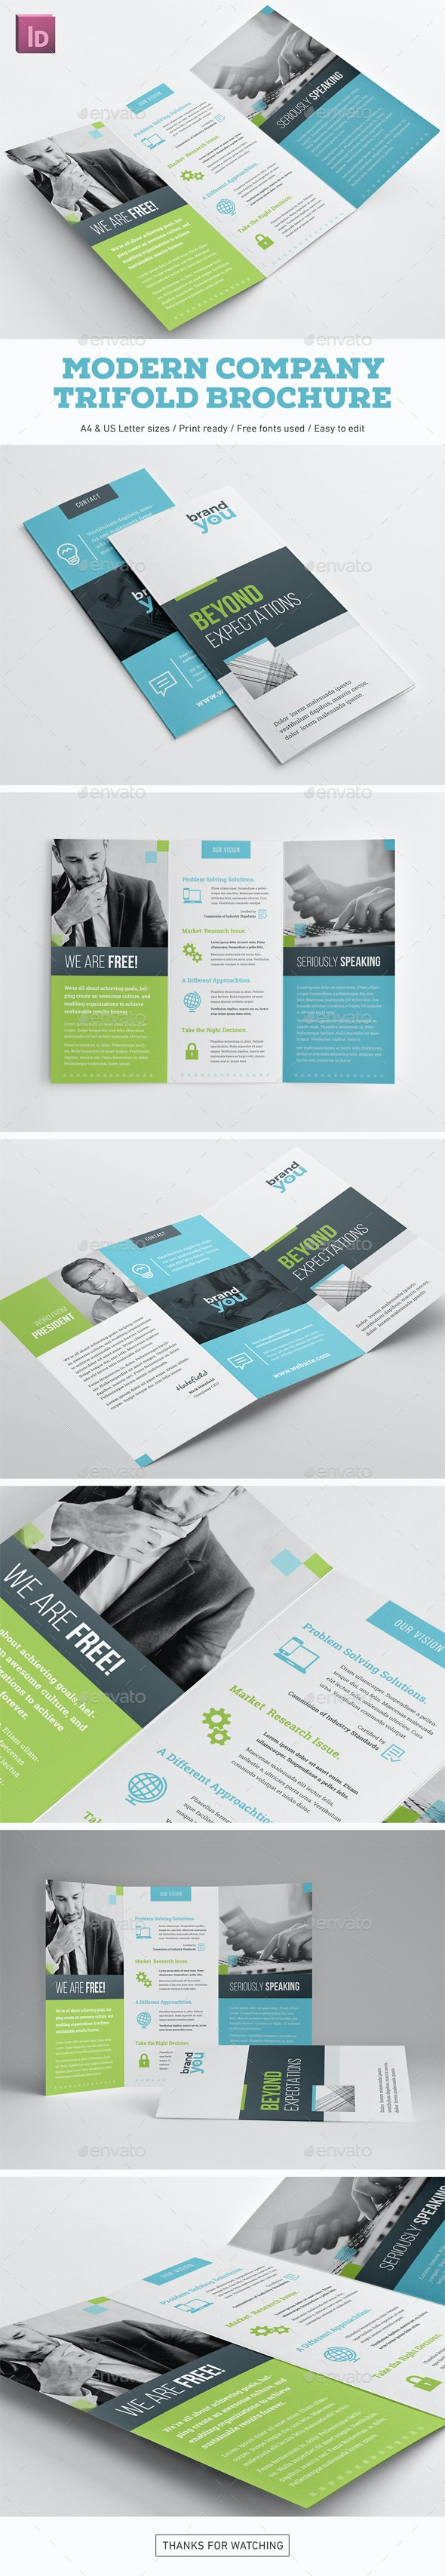 Modern Company Trifold Brochure - Corporate Brochures